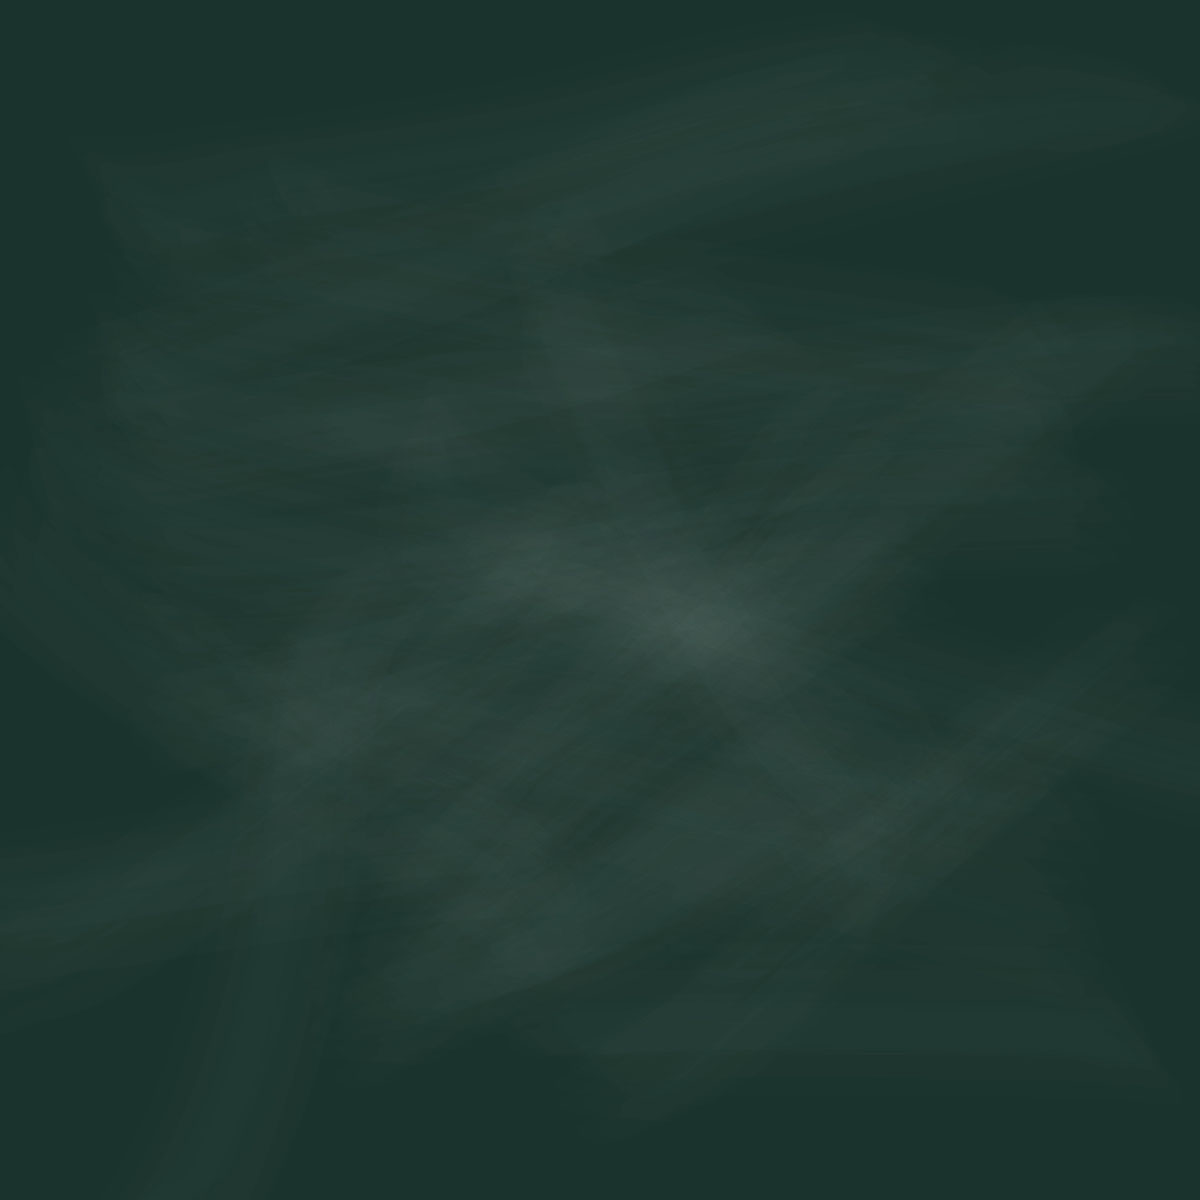 Chalkboard Background Free Vector Art 71638 Free Downloads